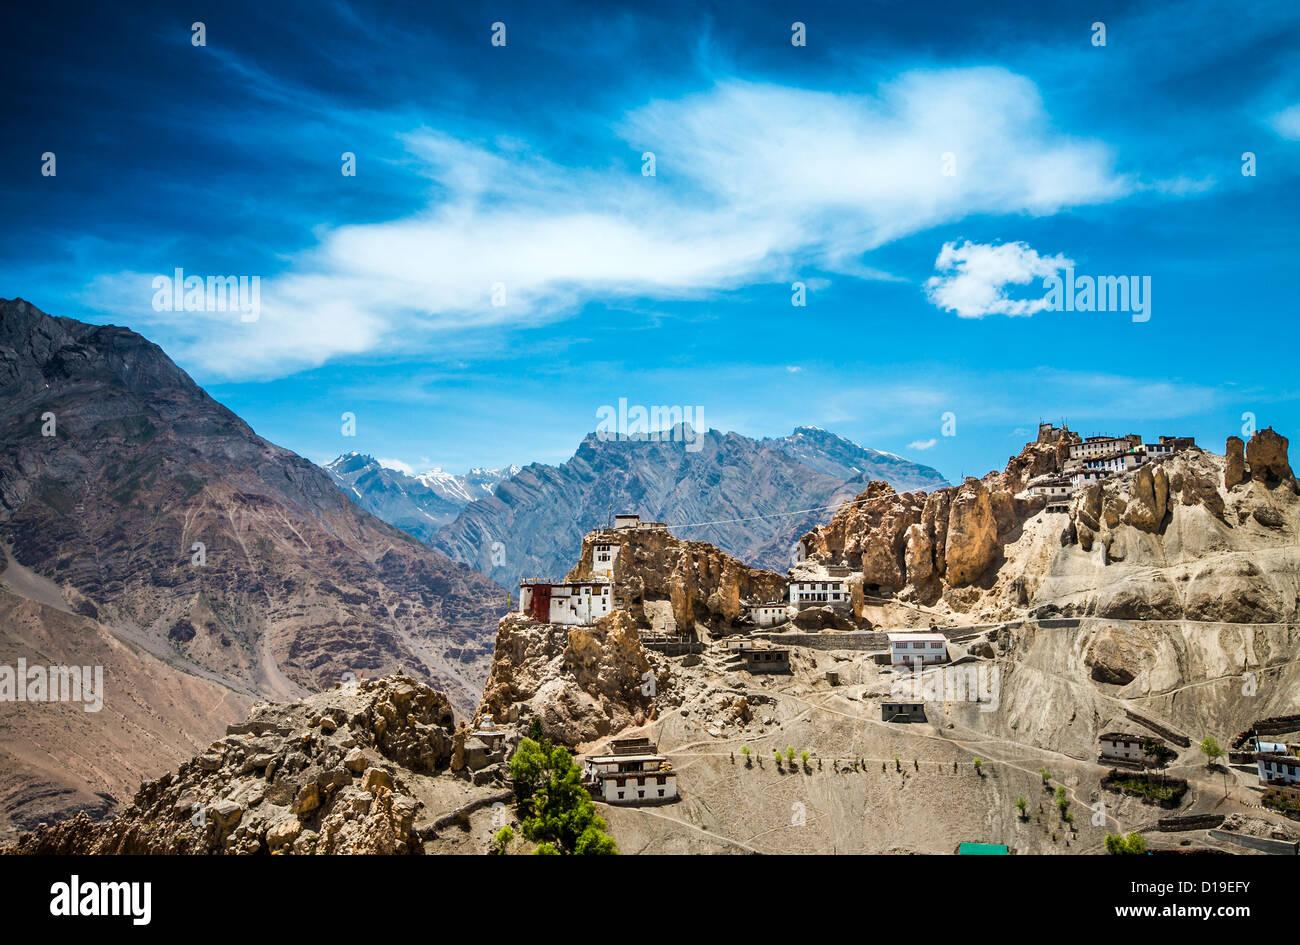 Dhankar gompa. La vallée de Spiti, Himachal Pradesh, Inde Photo Stock